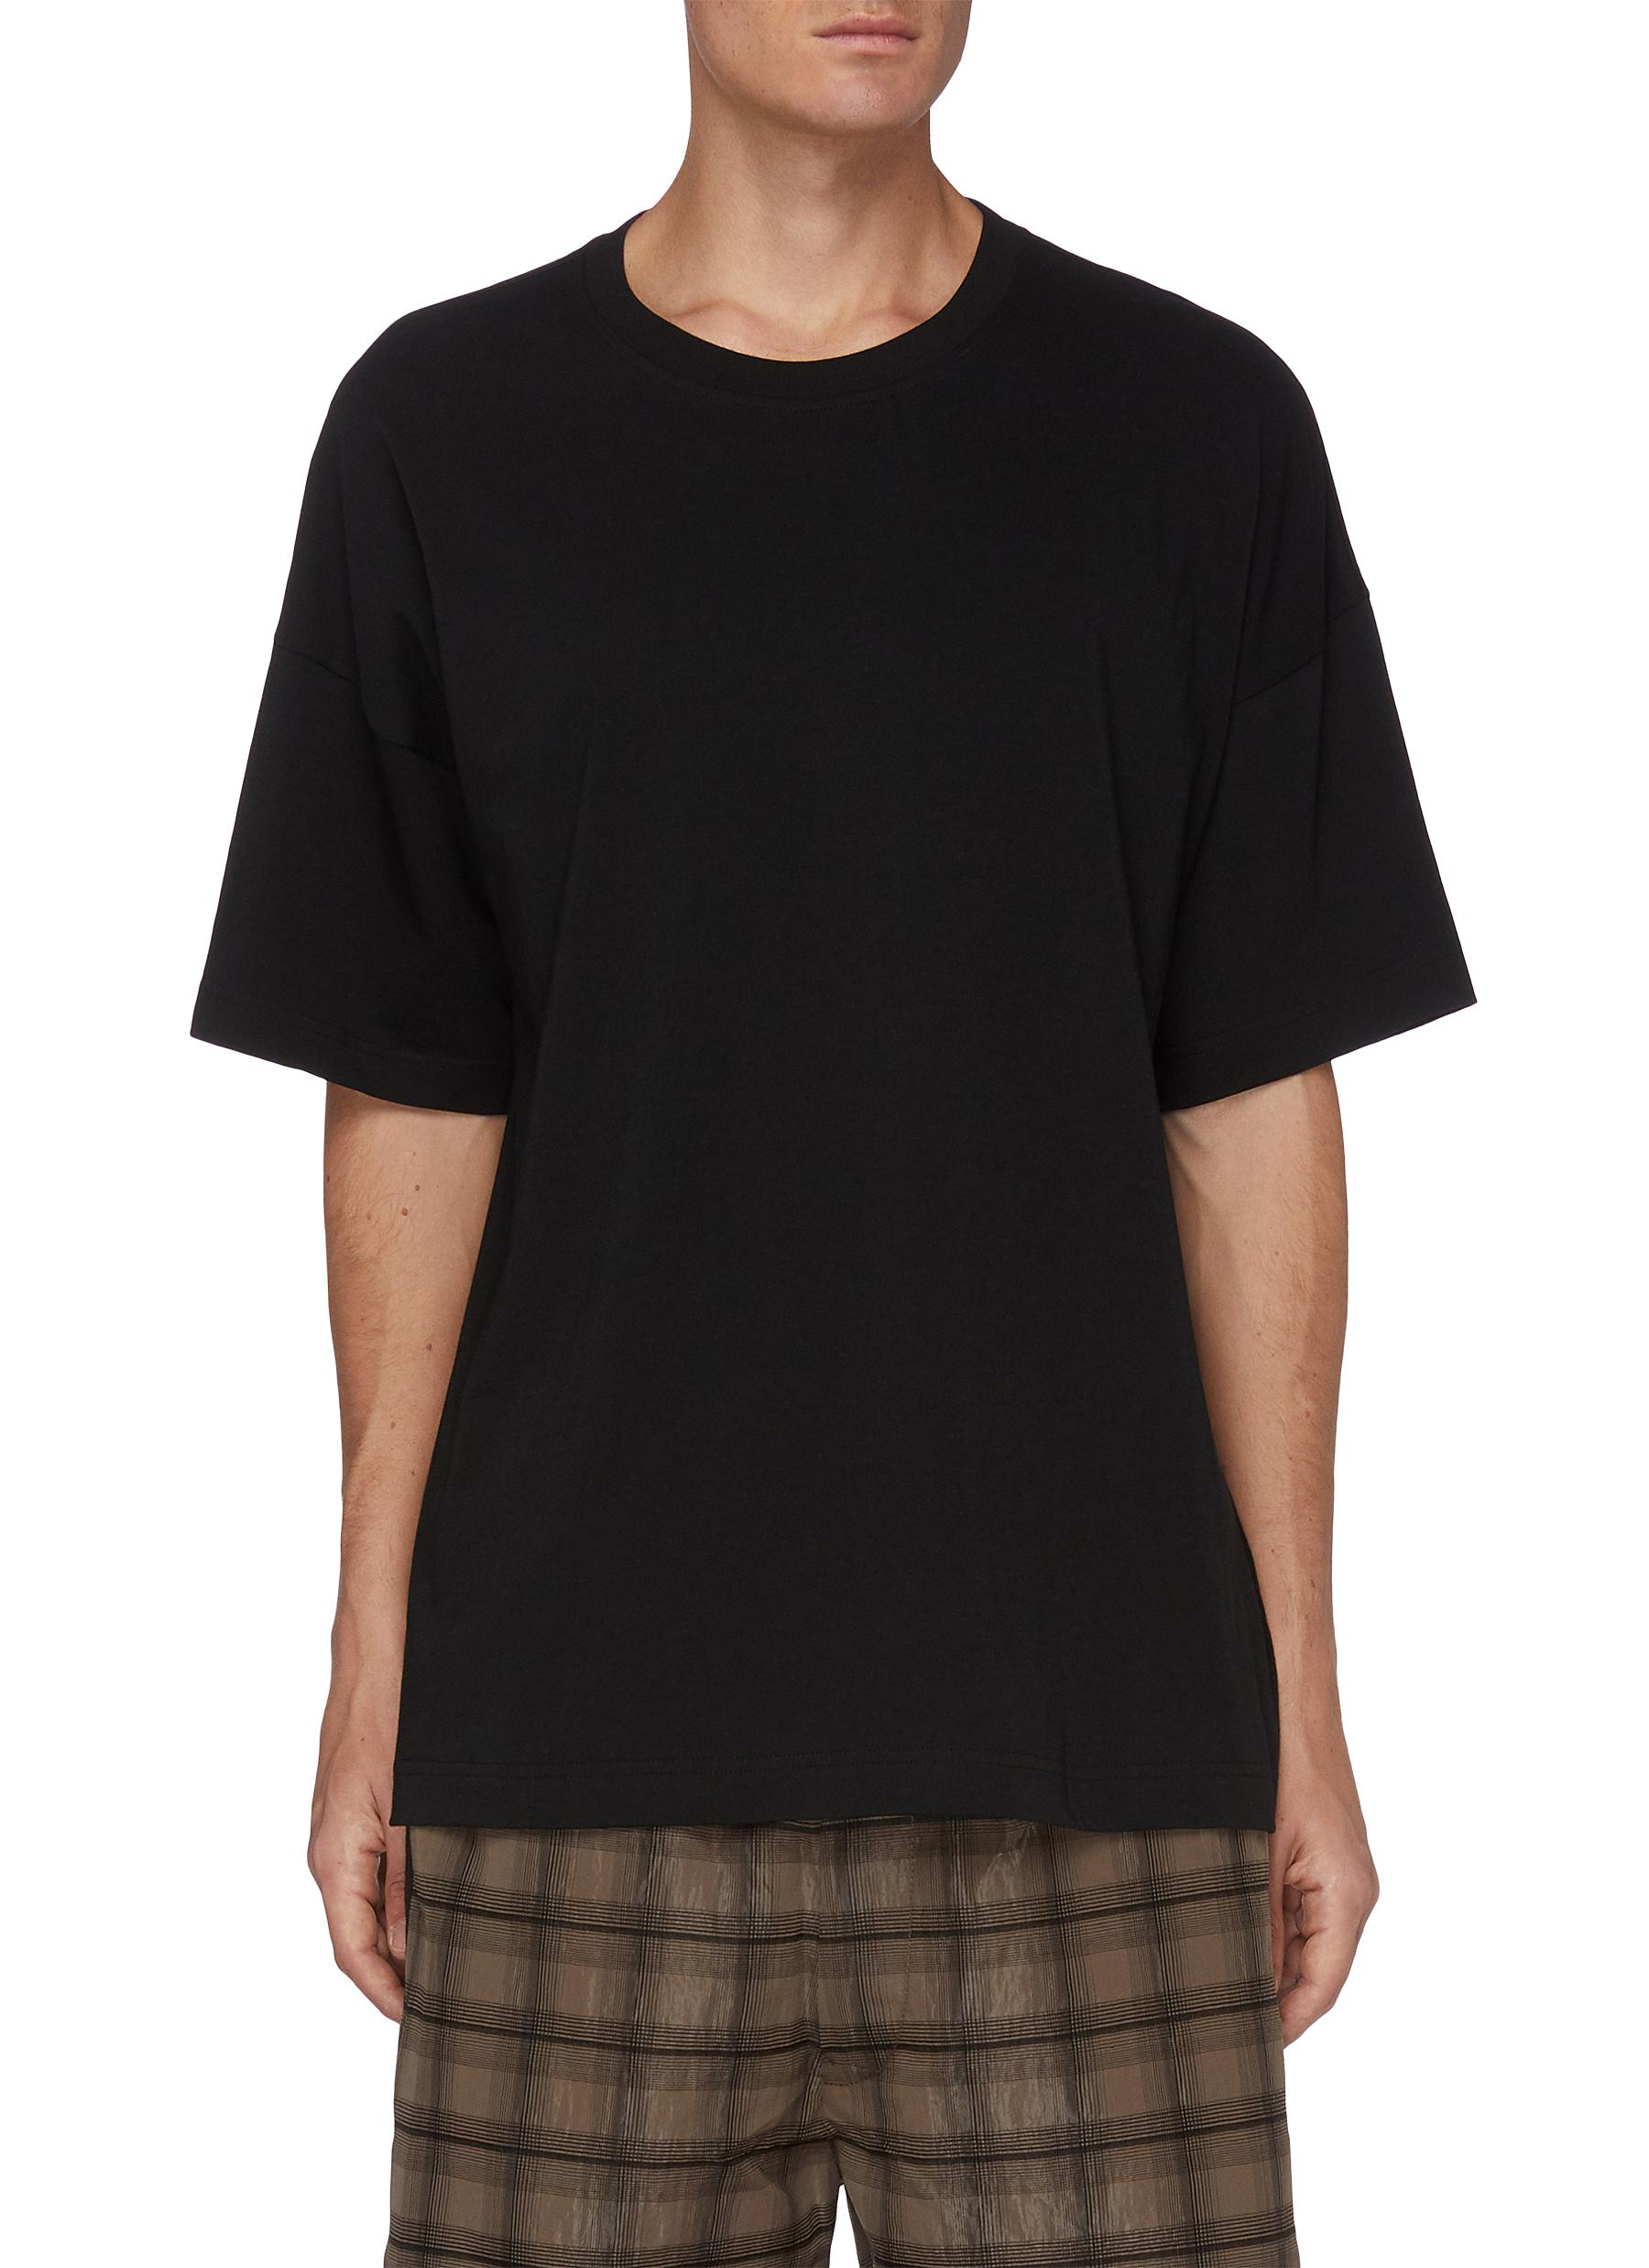 Ziggy Chen T-shirts GRAPHIC BACK PRINT T-SHIRT